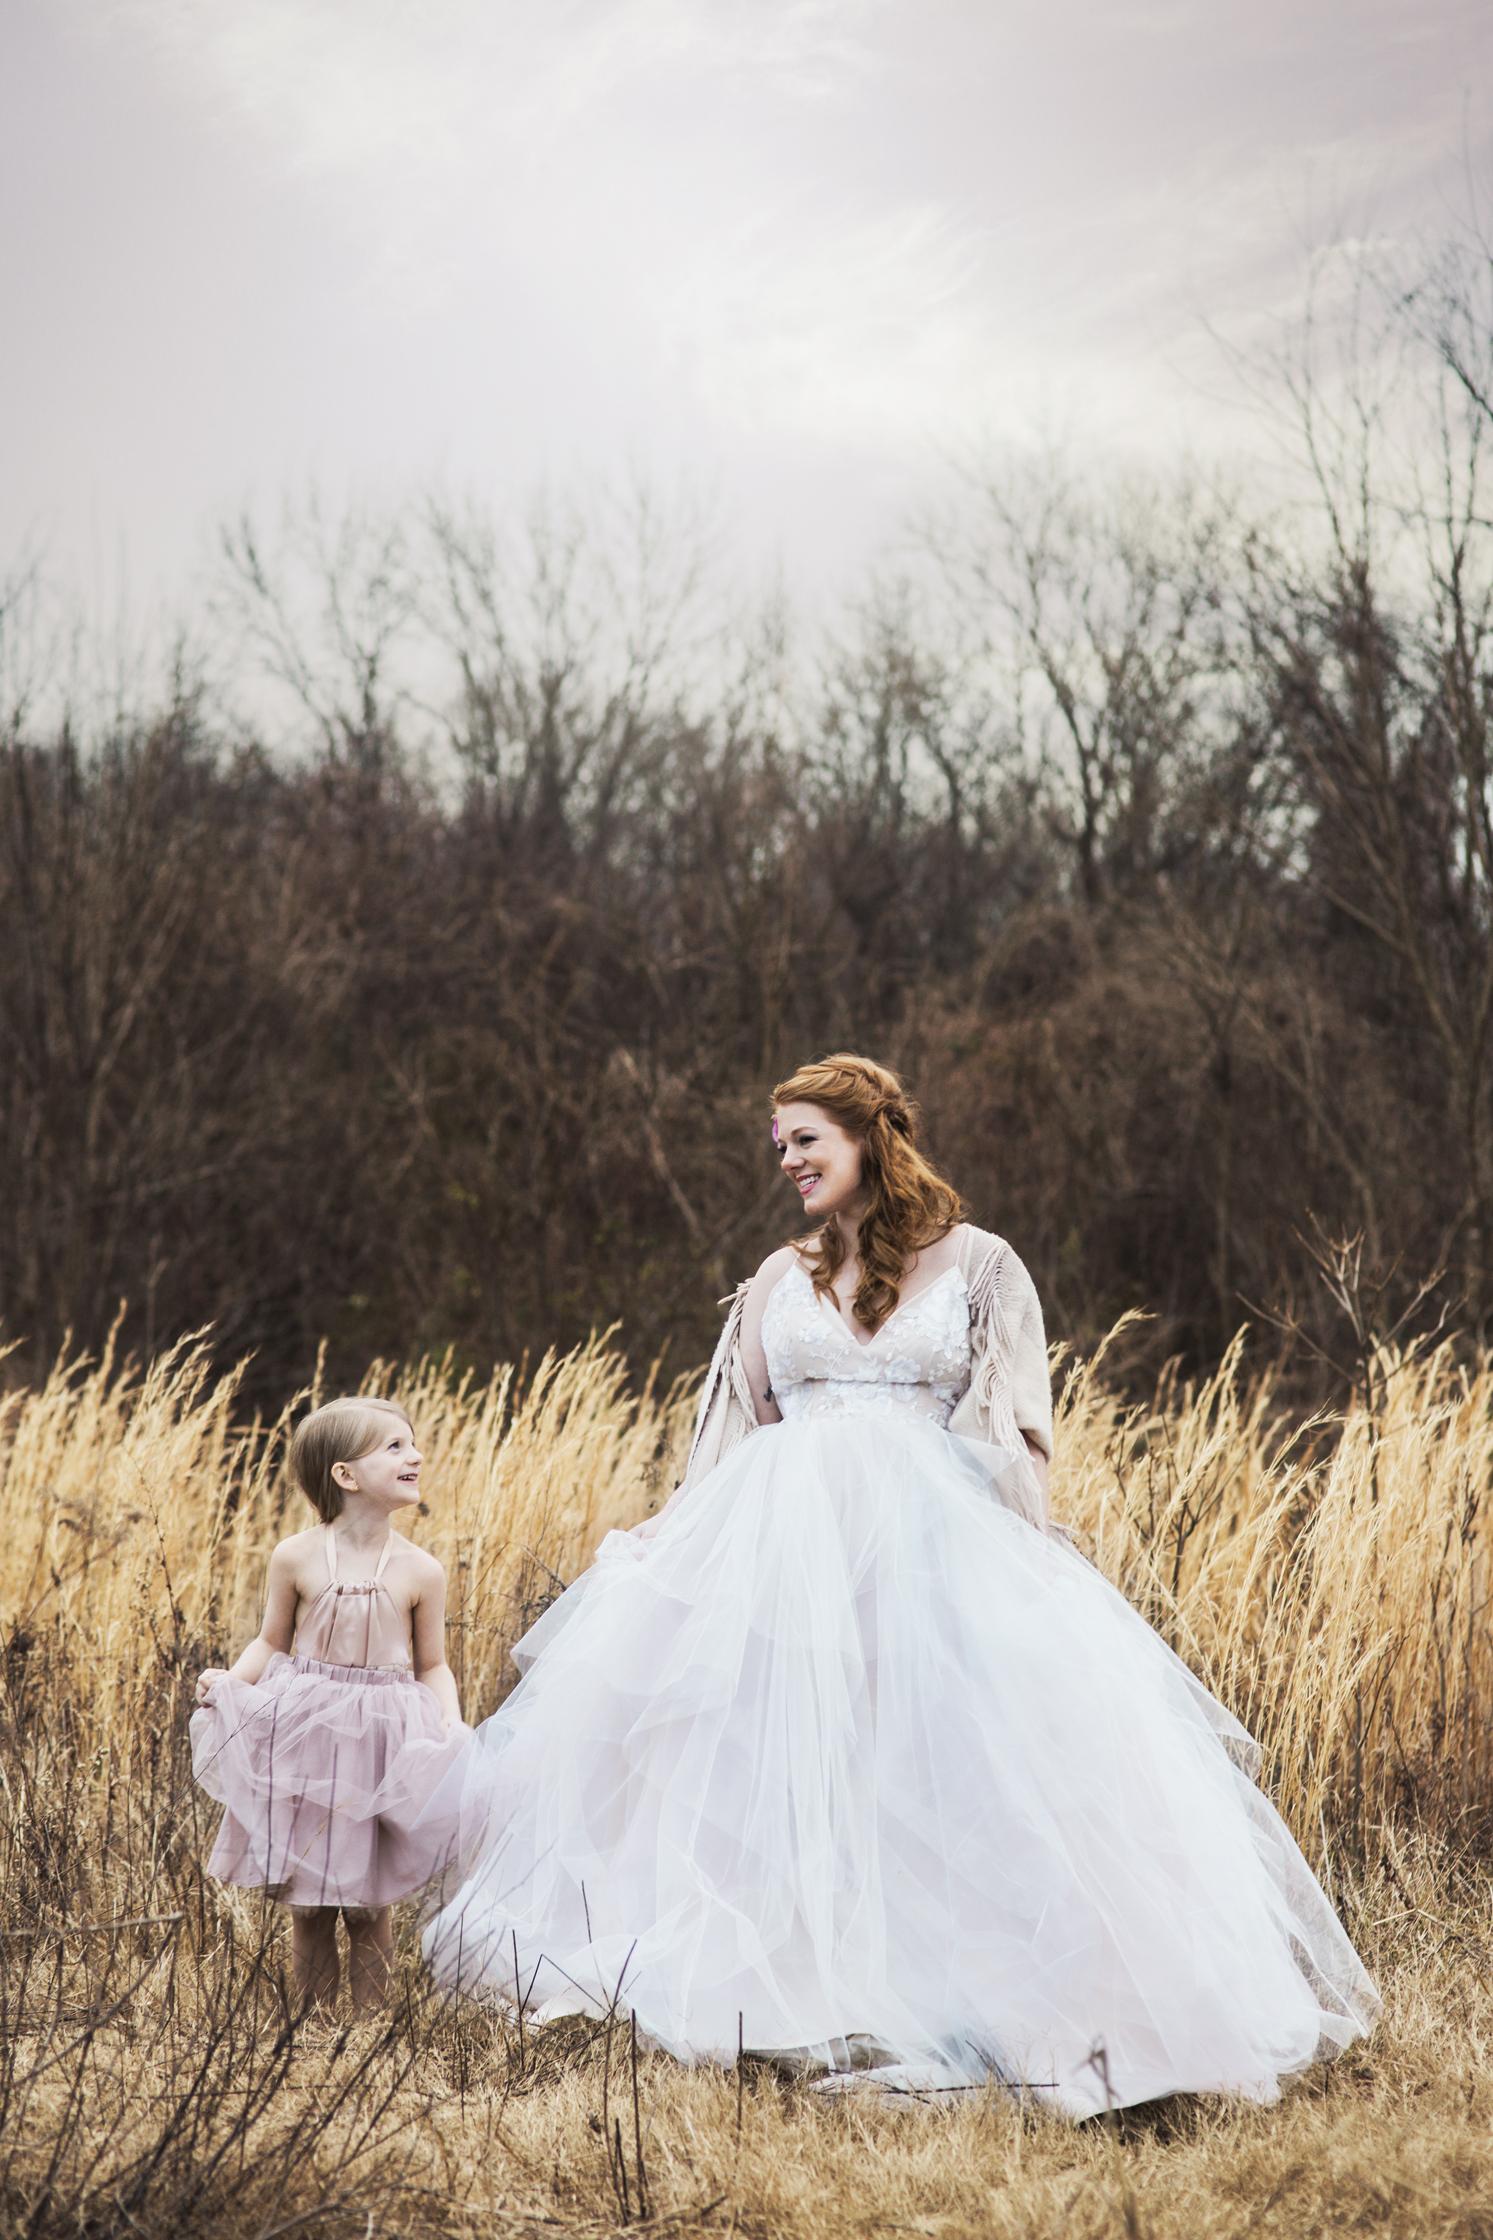 Sara + Matt + Ella _Give Back Bride_Styled Shoot _K. Stoddard Photography034.jpg